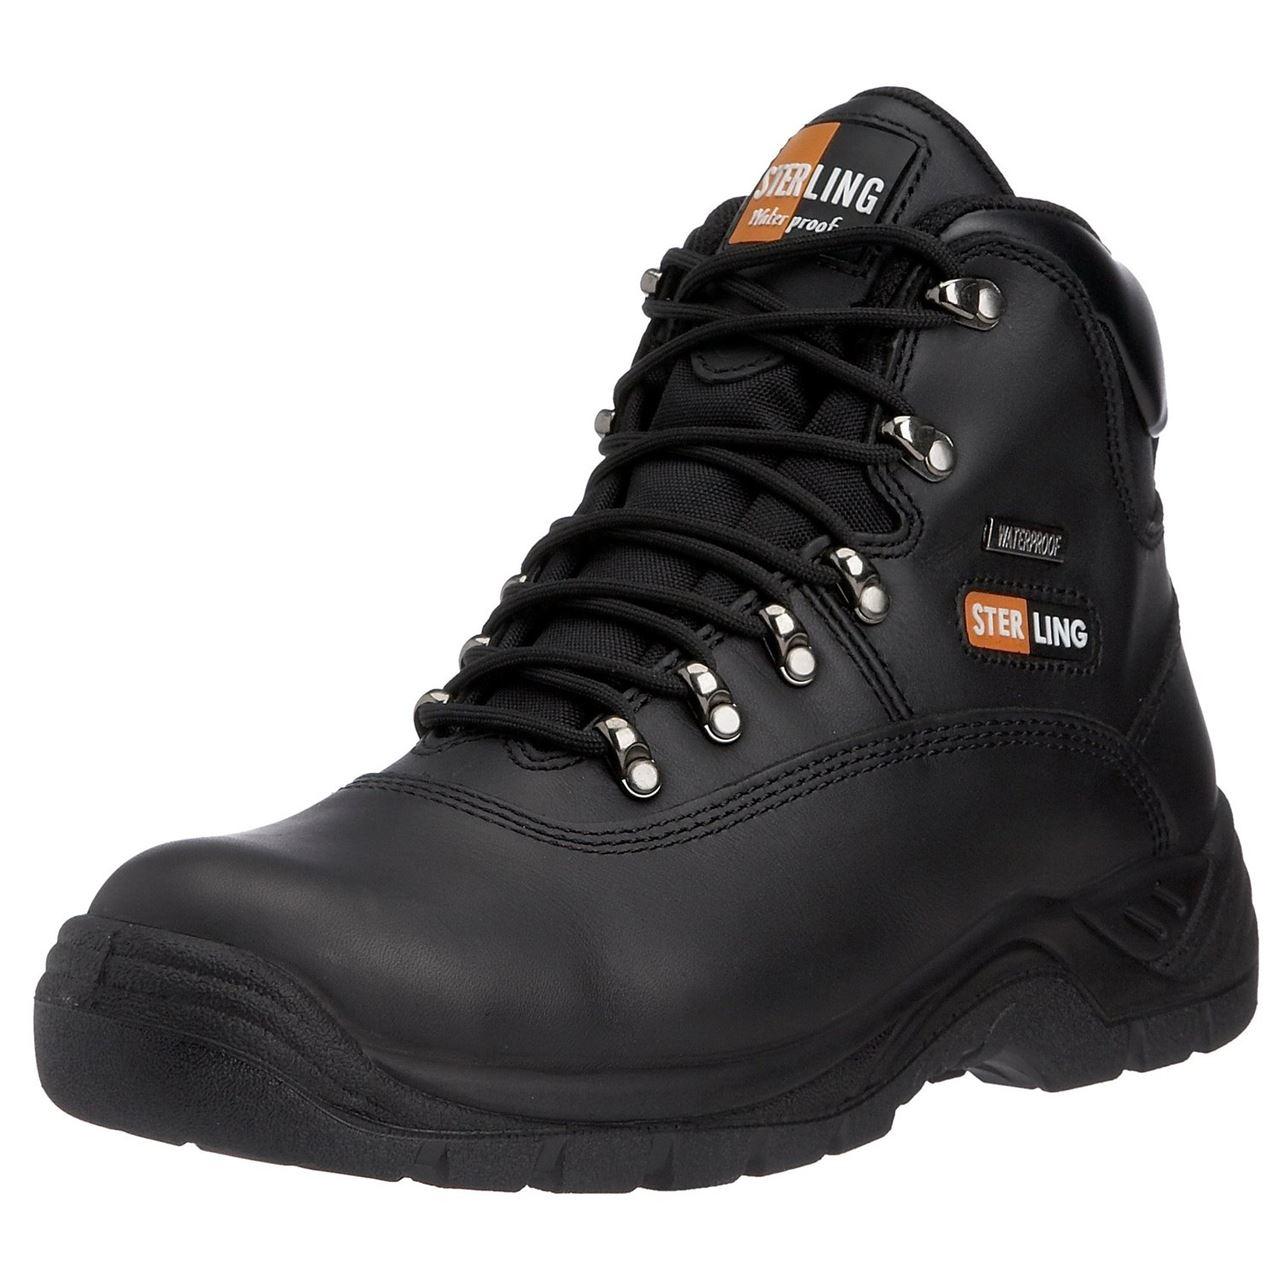 sterling unisex safety hiker boot waterproof steel toe cap